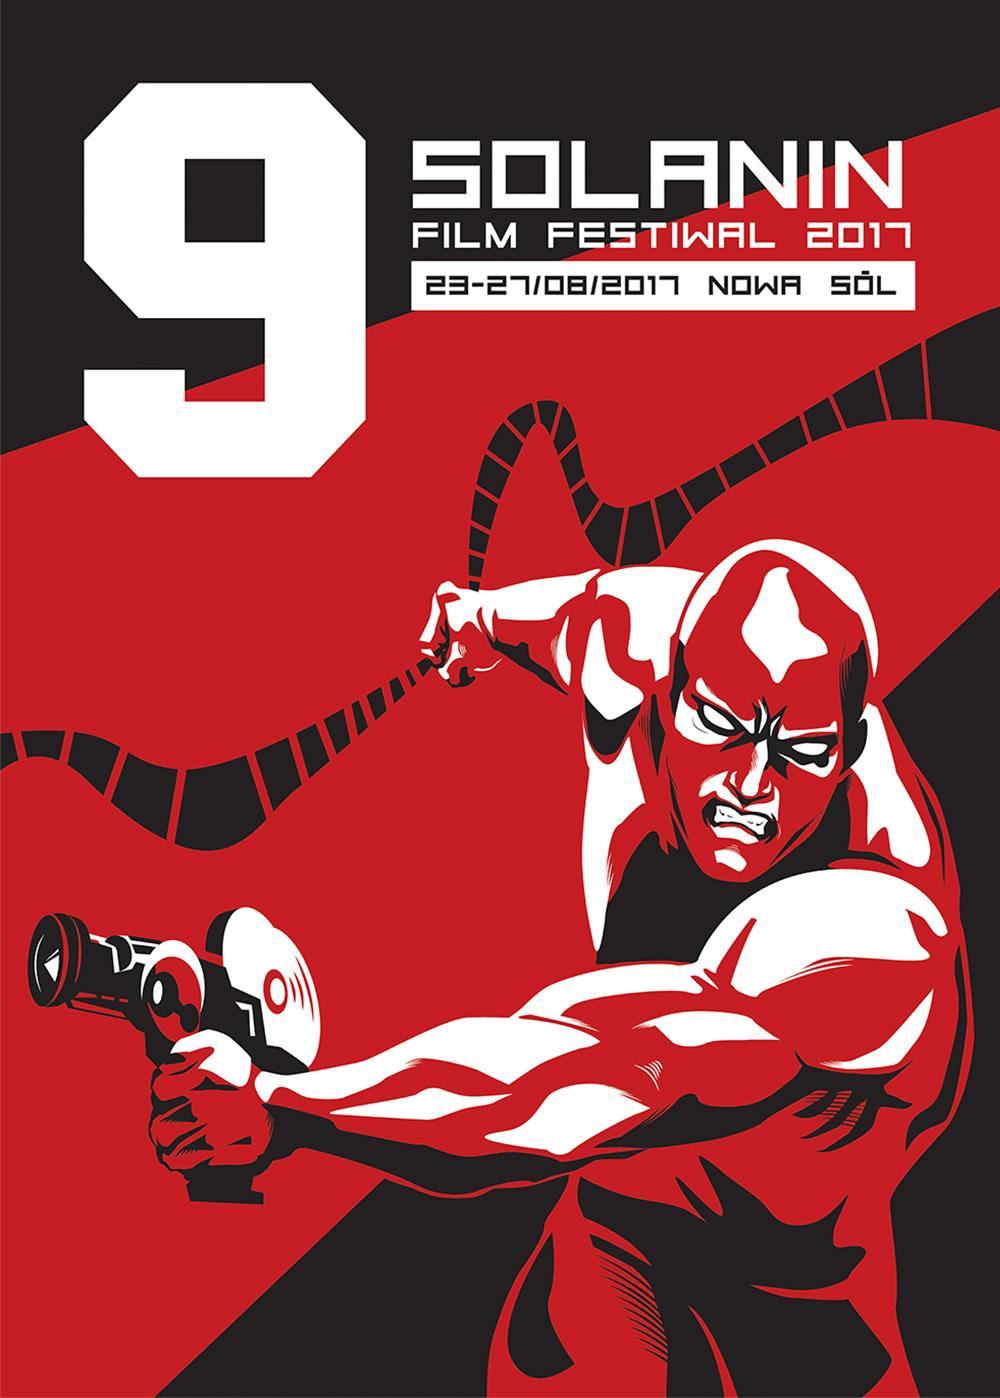 Plakat 9. Solanin Film Festiwal